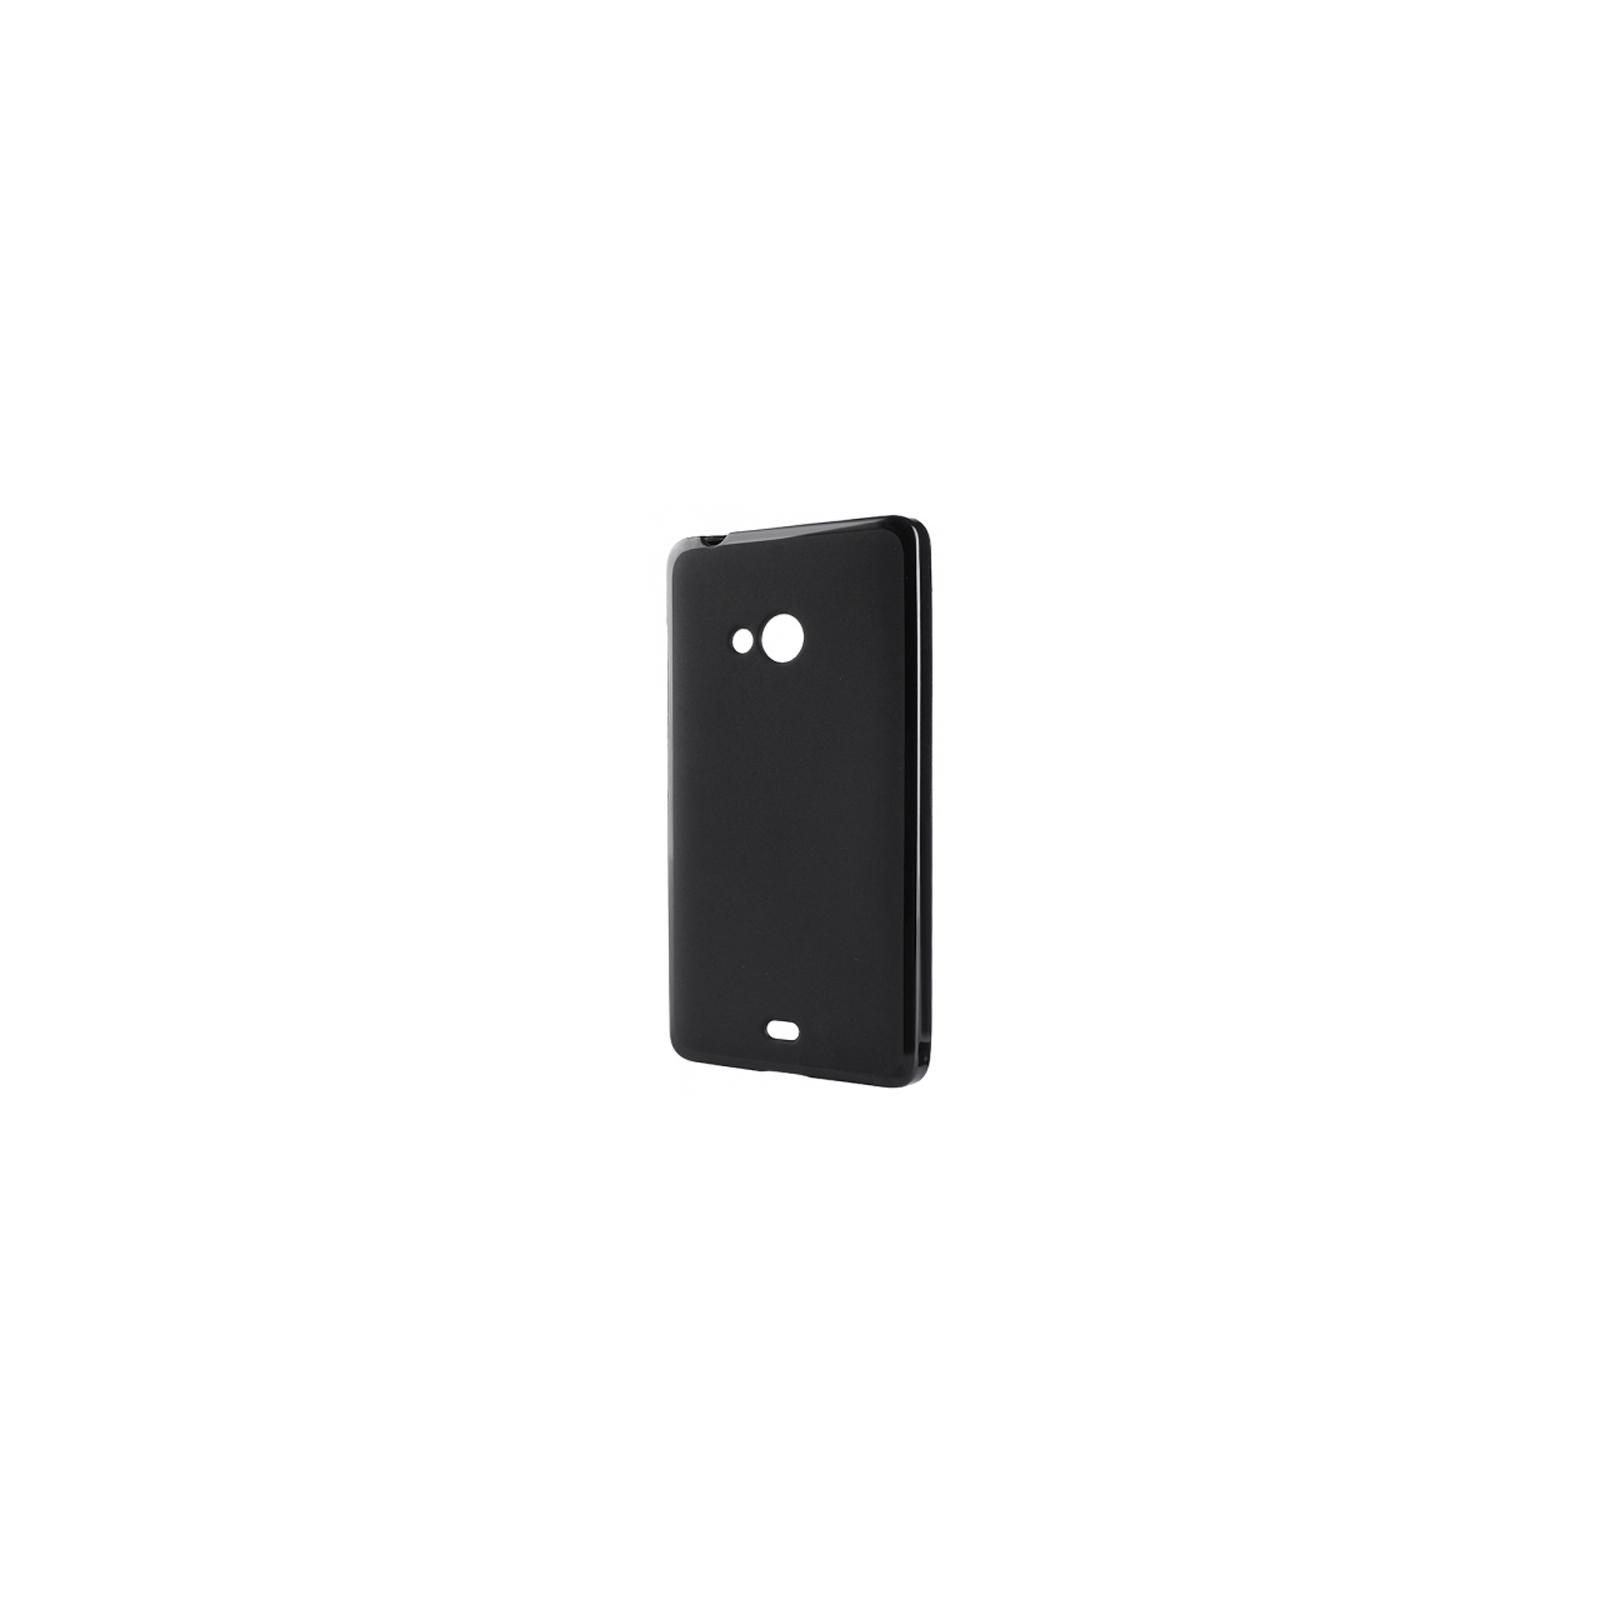 Чехол для моб. телефона Drobak для Microsoft Lumia 540 DS (Nokia) (Black) (215627)